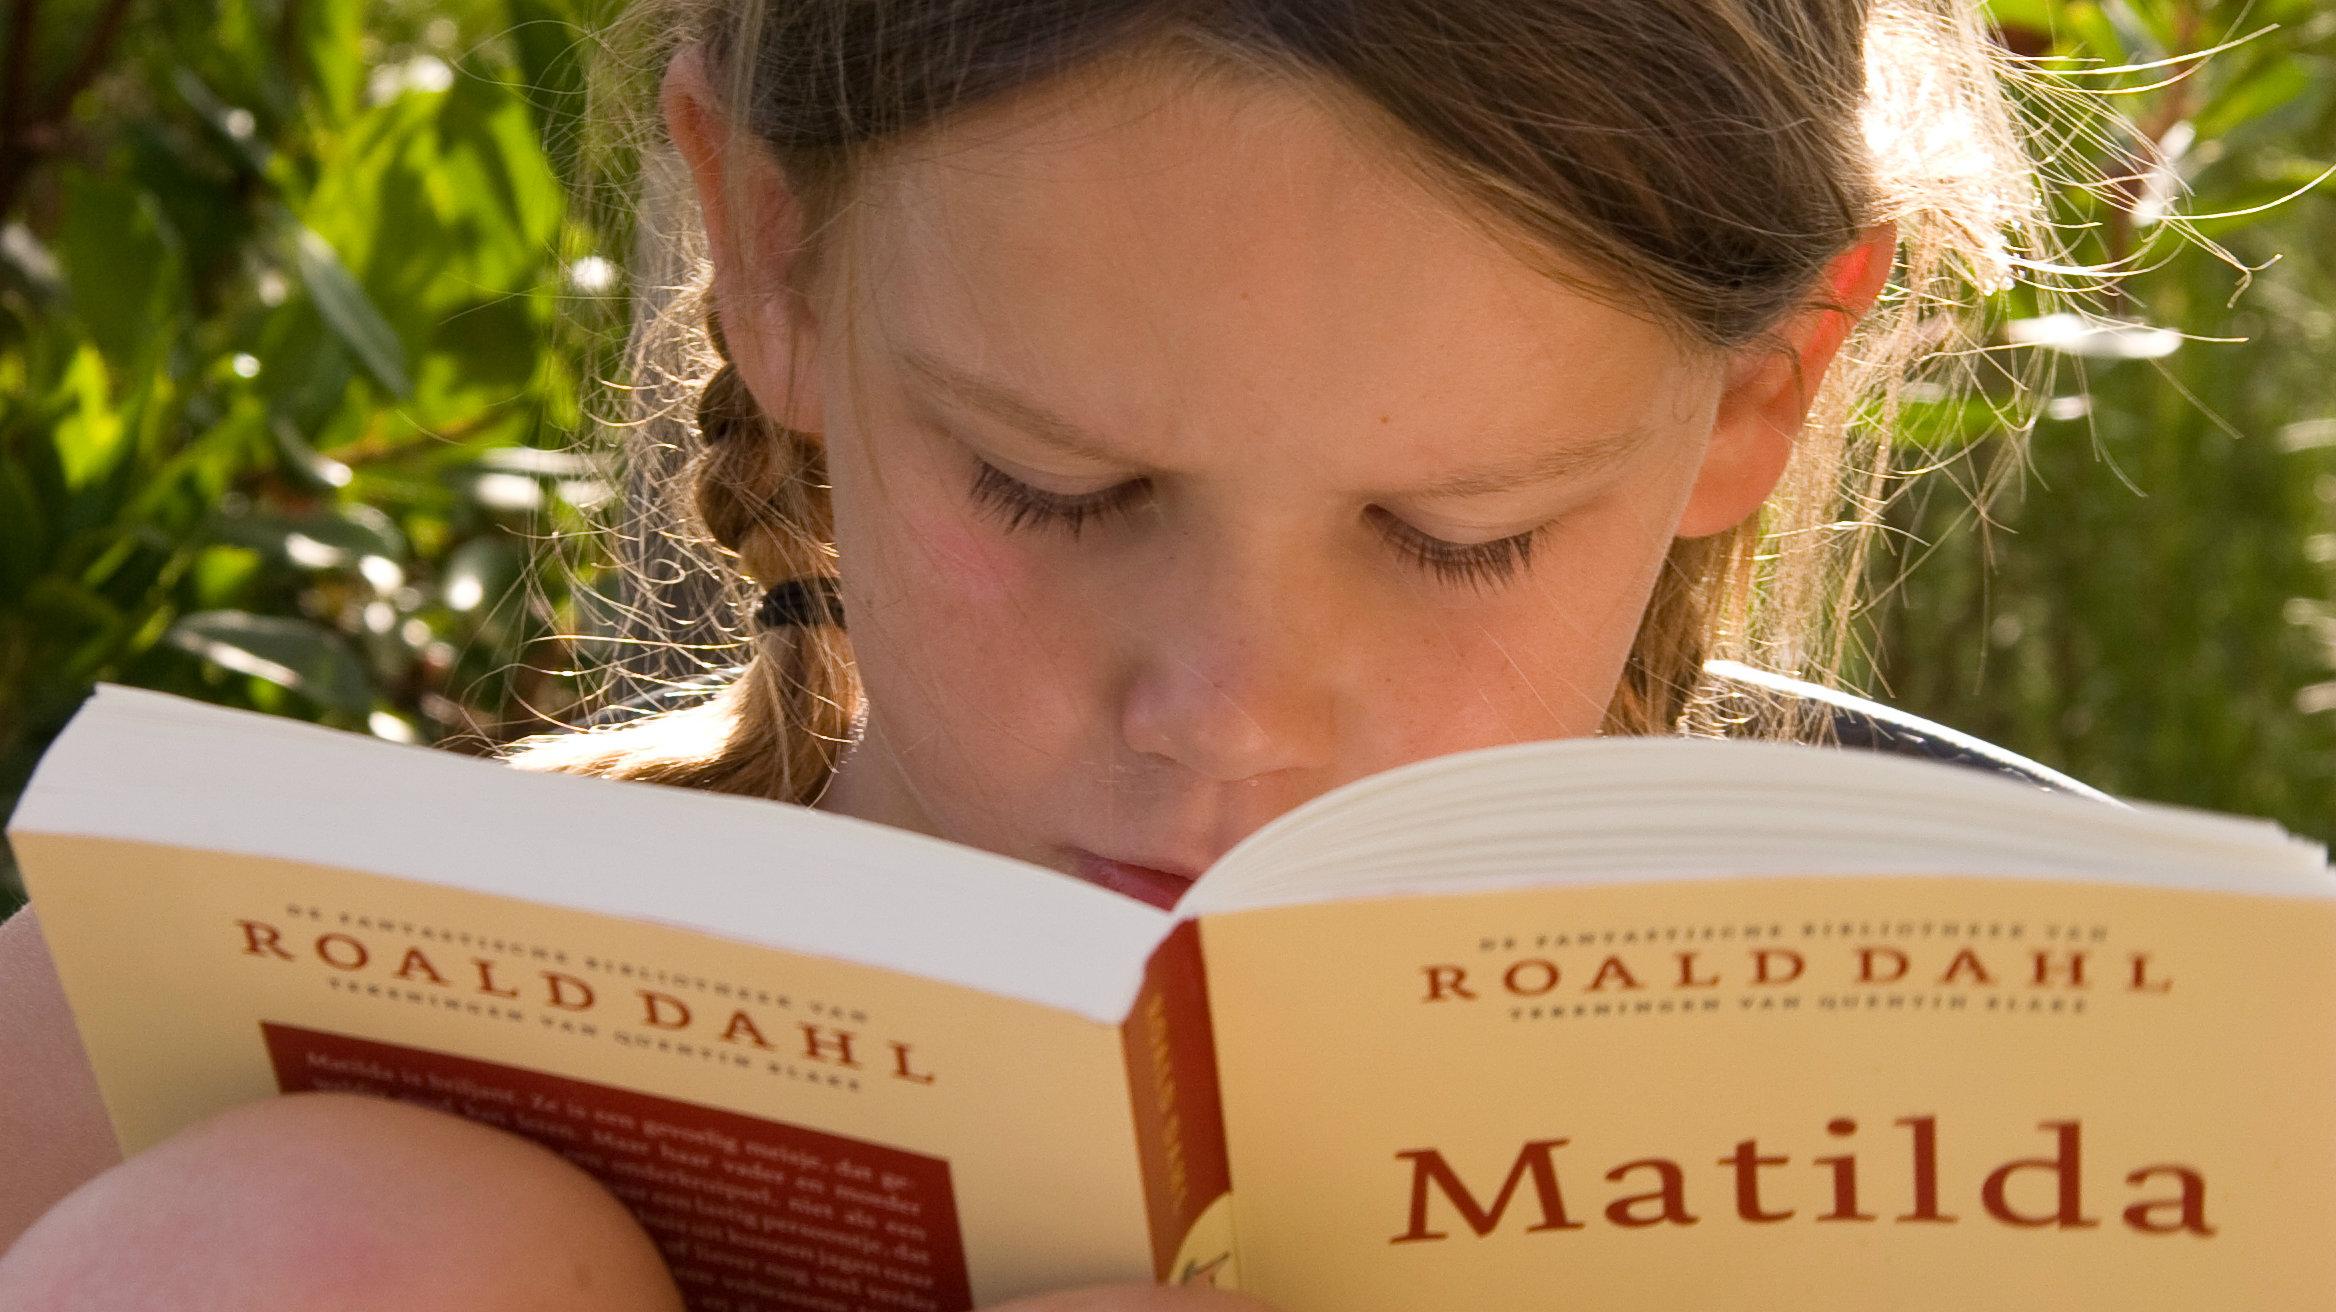 Splendiferous Things You Didn't Know About Roald Dahl